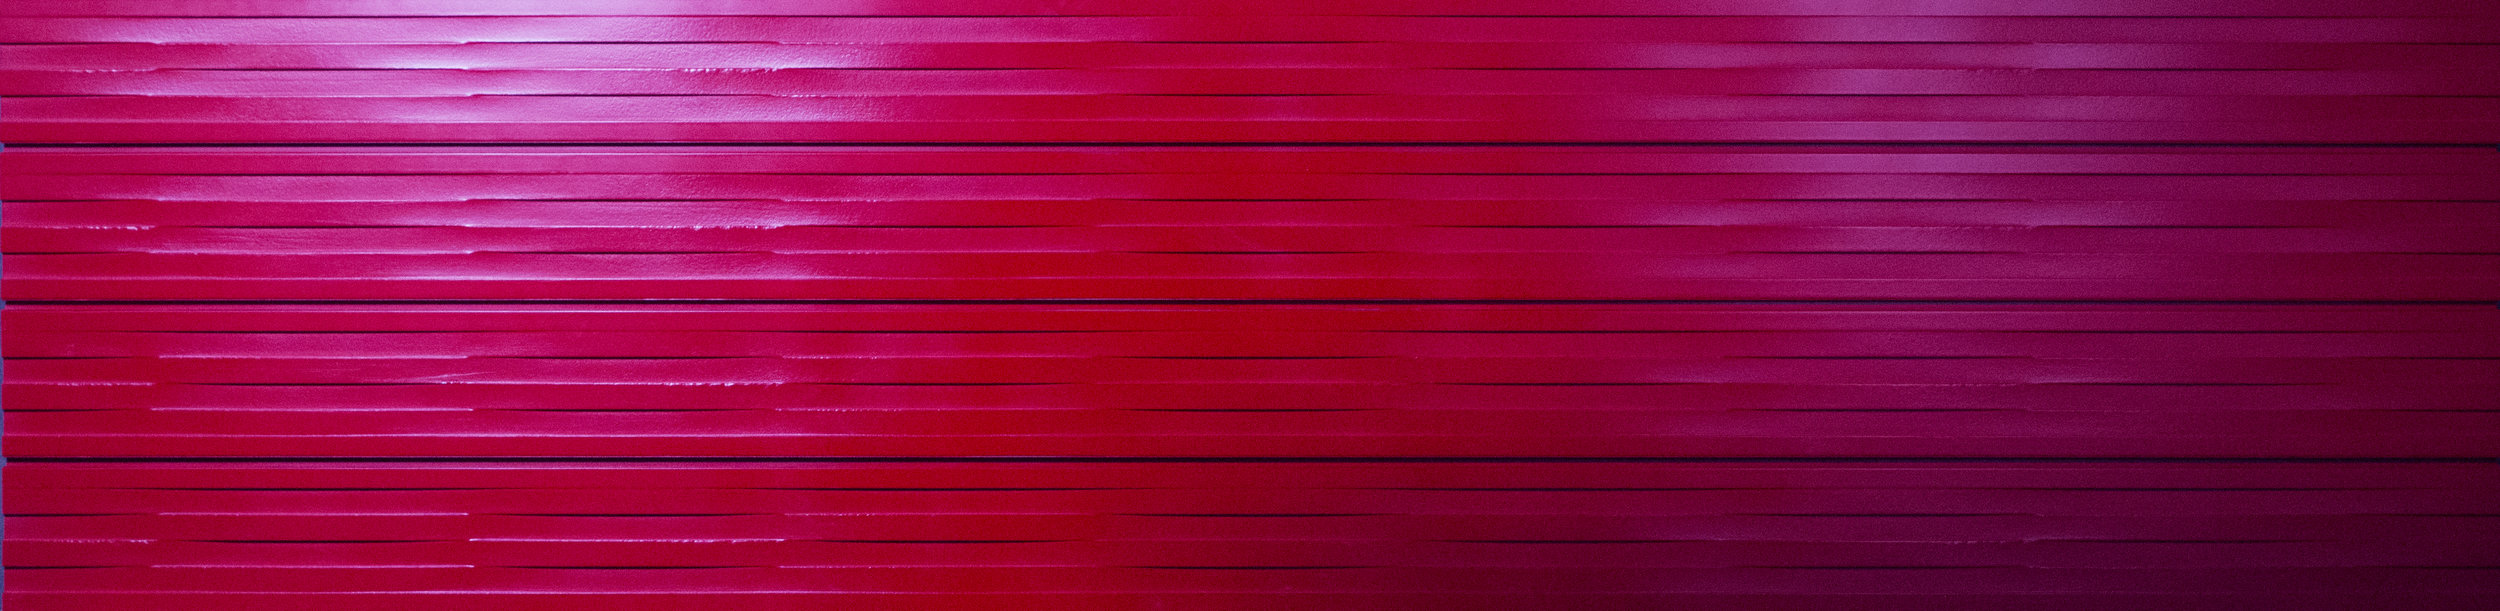 Weave red panel stx.jpg